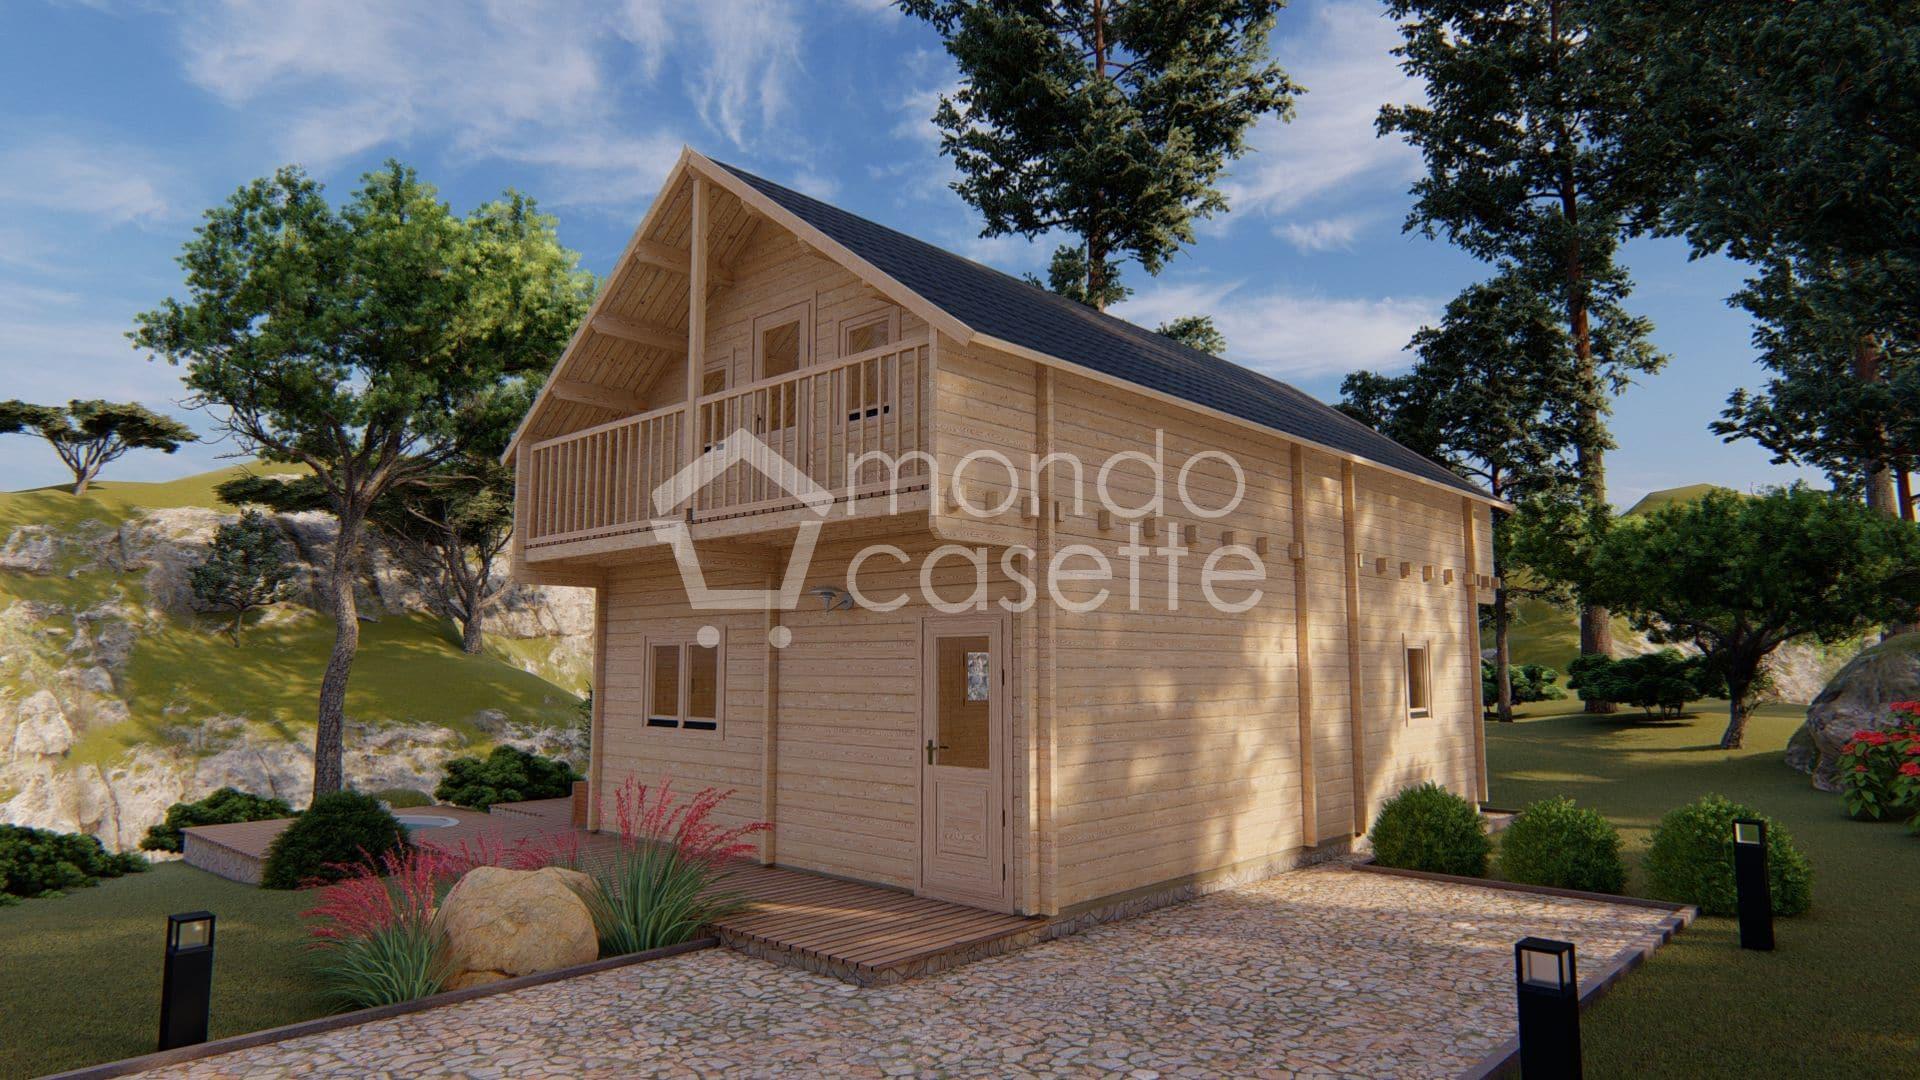 Chalet casa in legno Verona - 8,7×5,7 - pareti da 70 mm